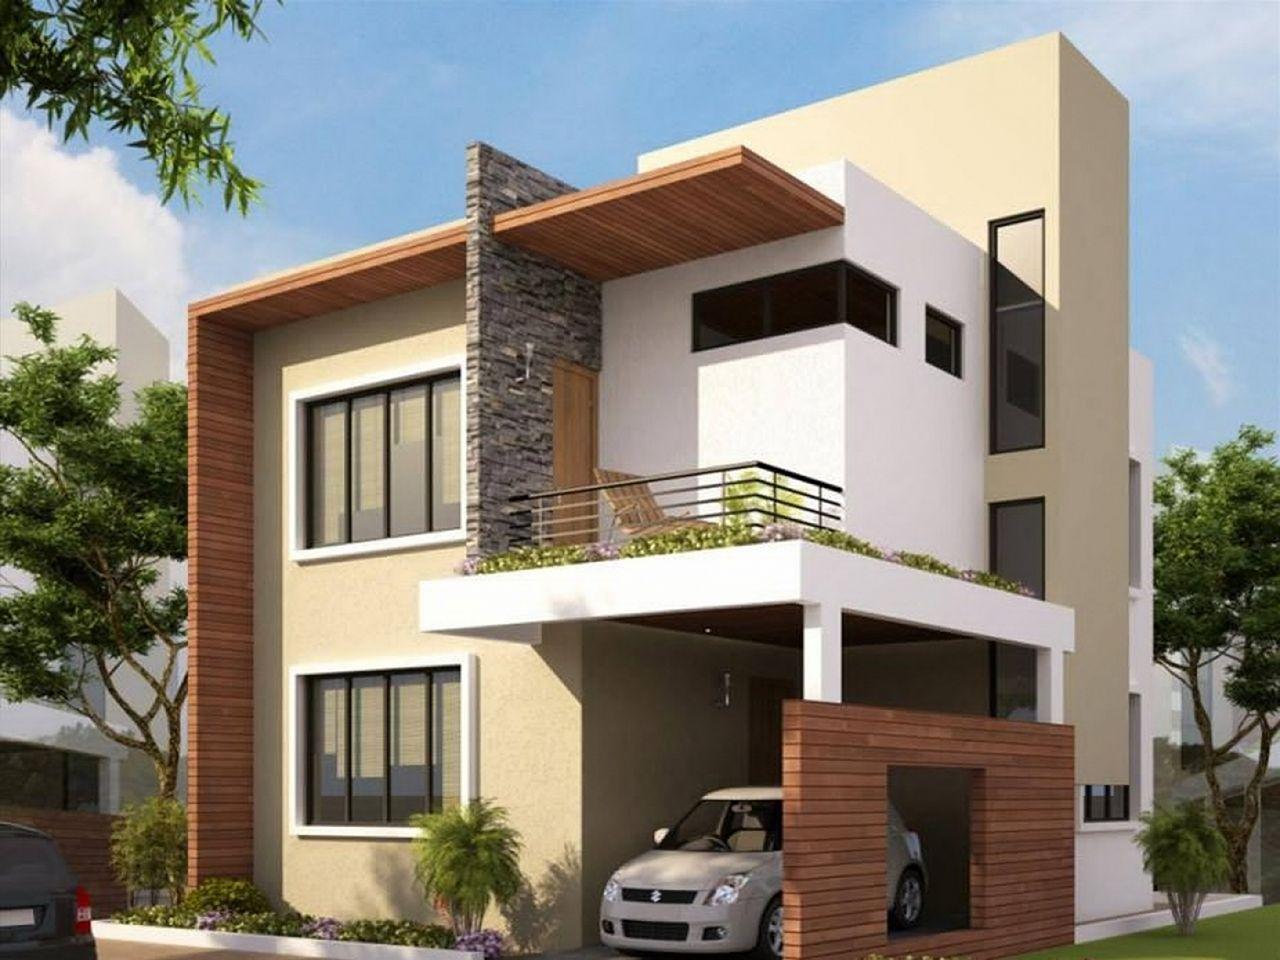 Mid century modern exterior house paint colors decoredo - Modern exterior house colors ...